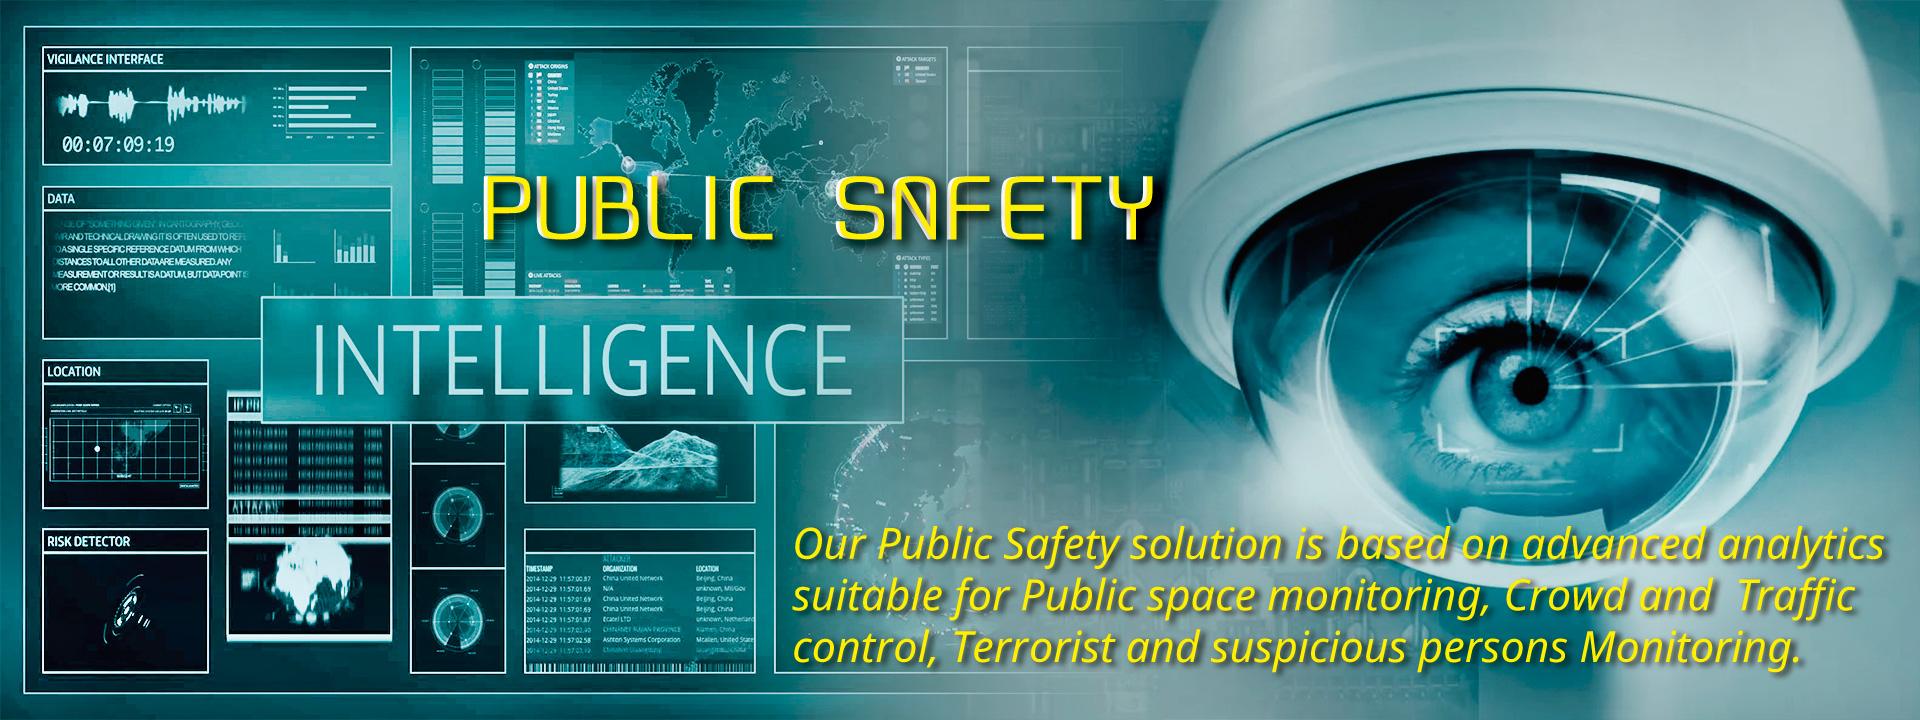 public_safety